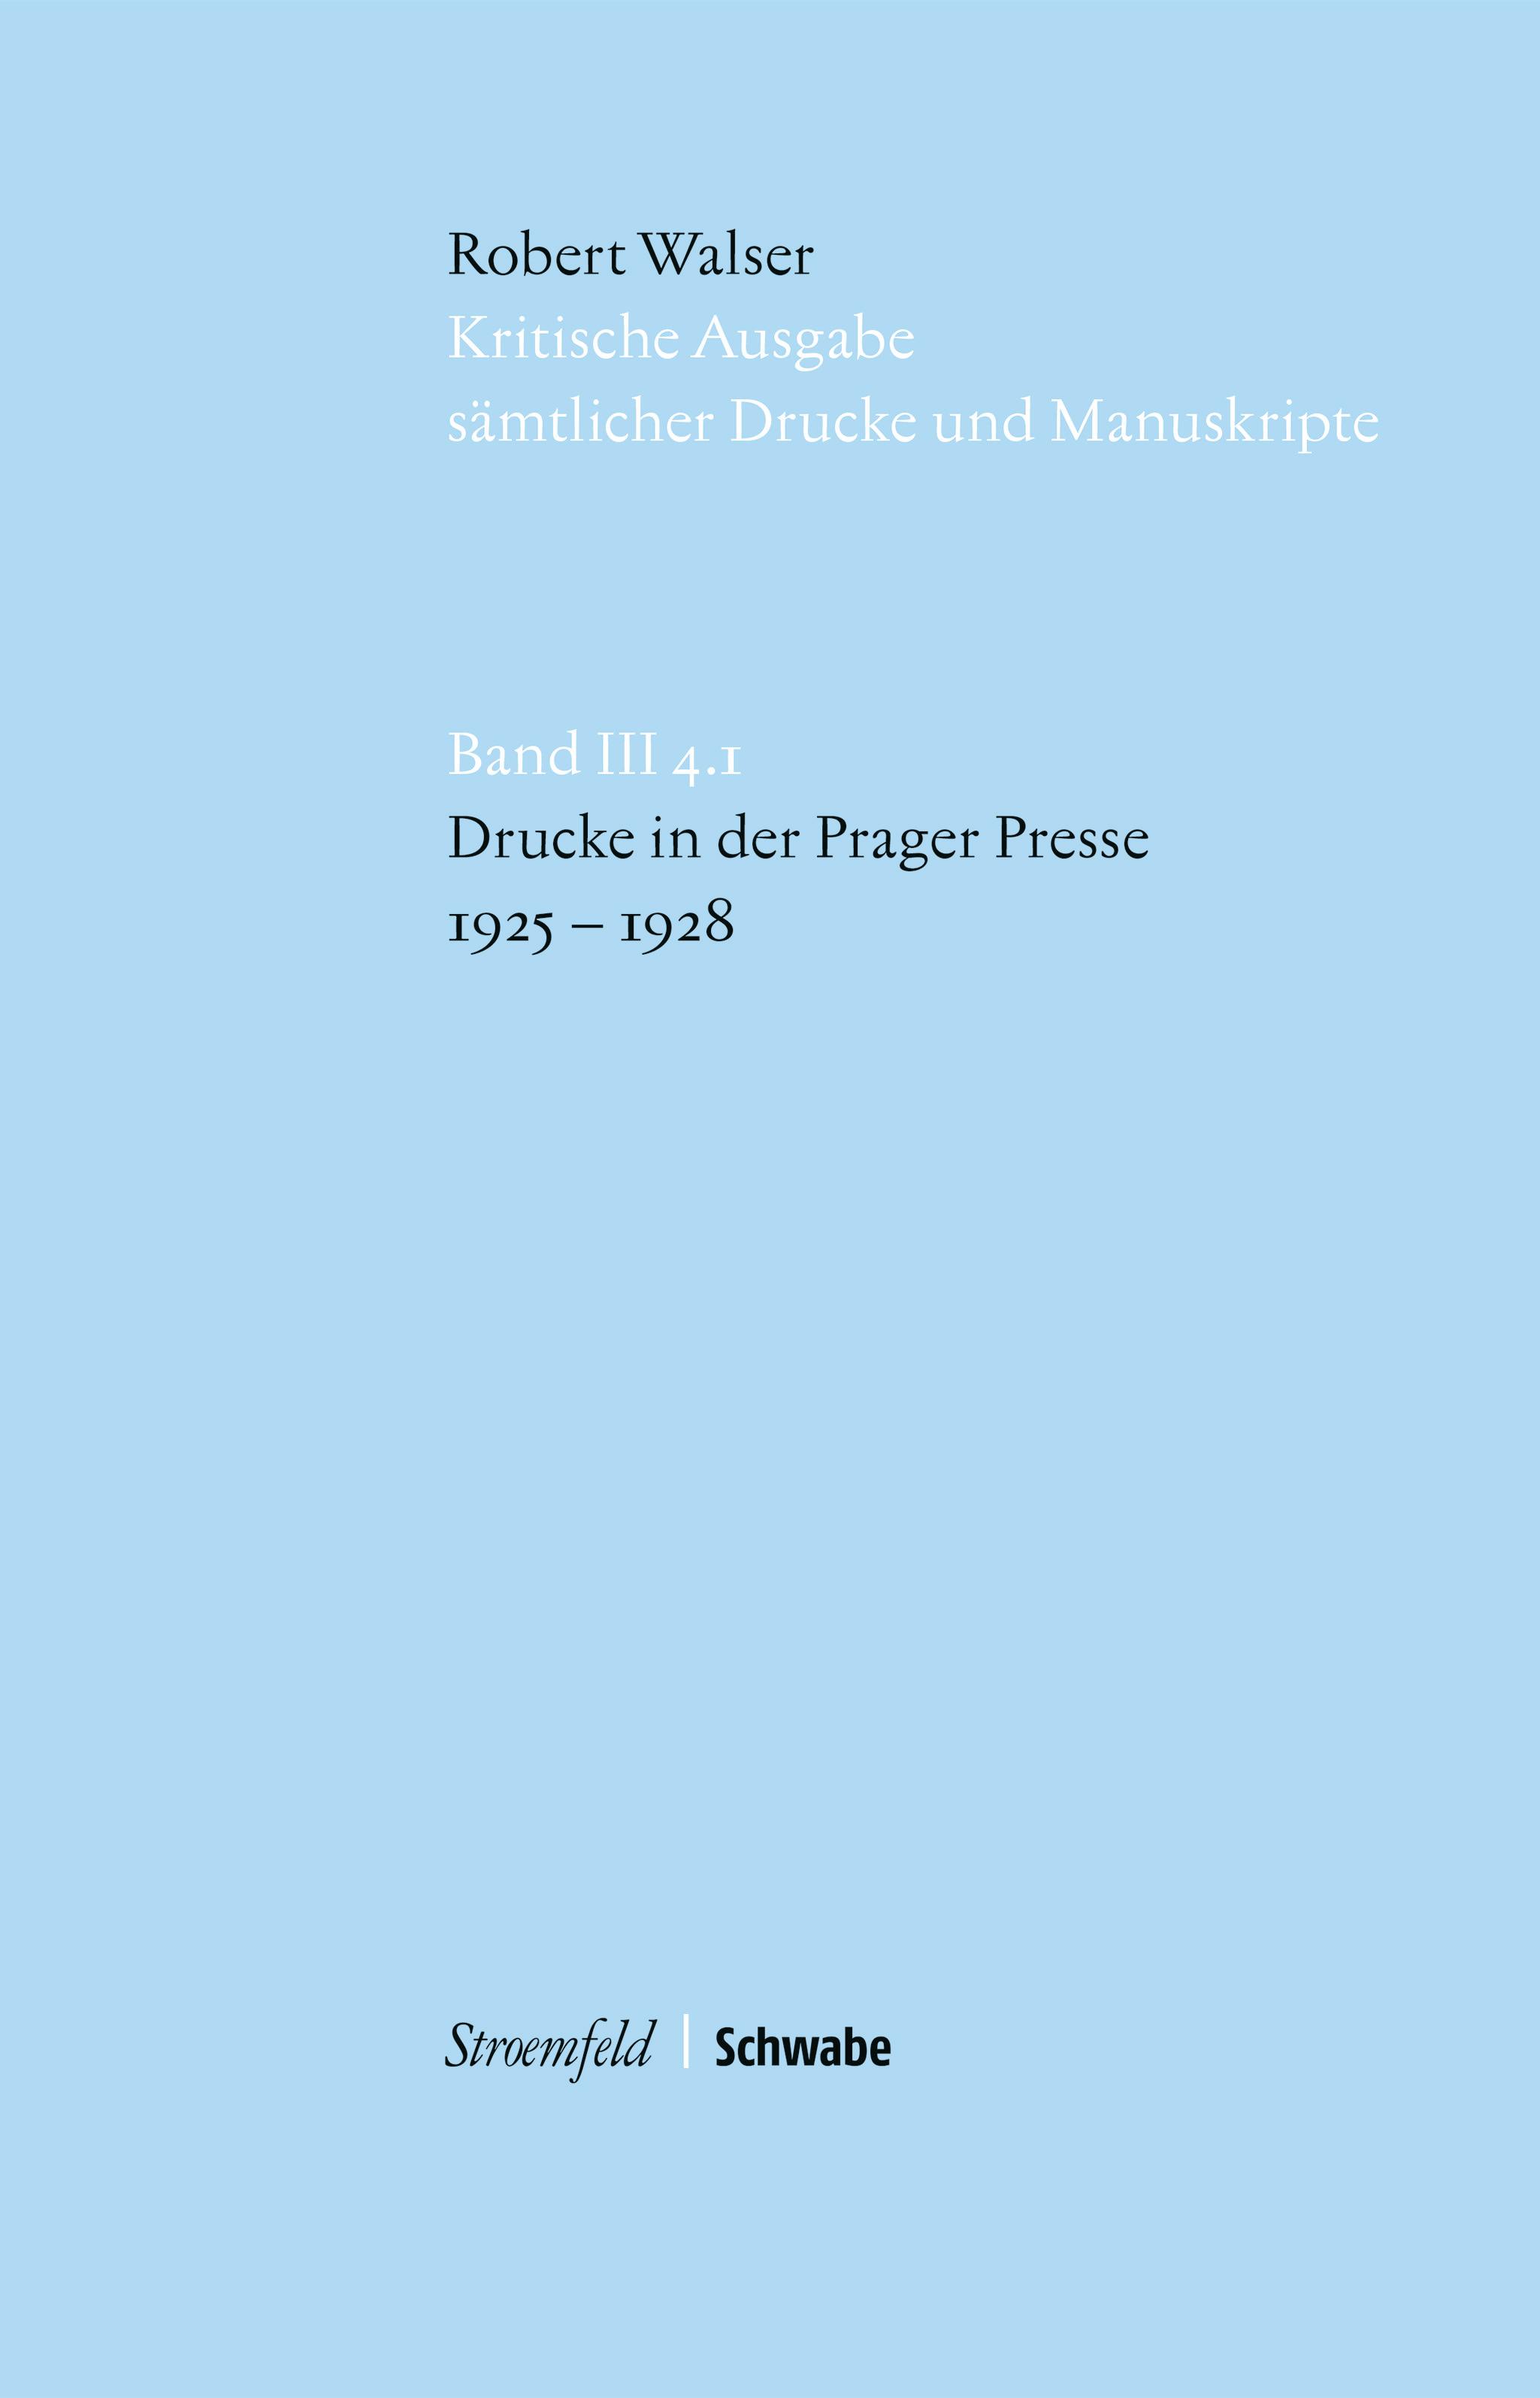 Kritische Robert Walser Ausgabe, Abt. III Drucke in Zeitungen